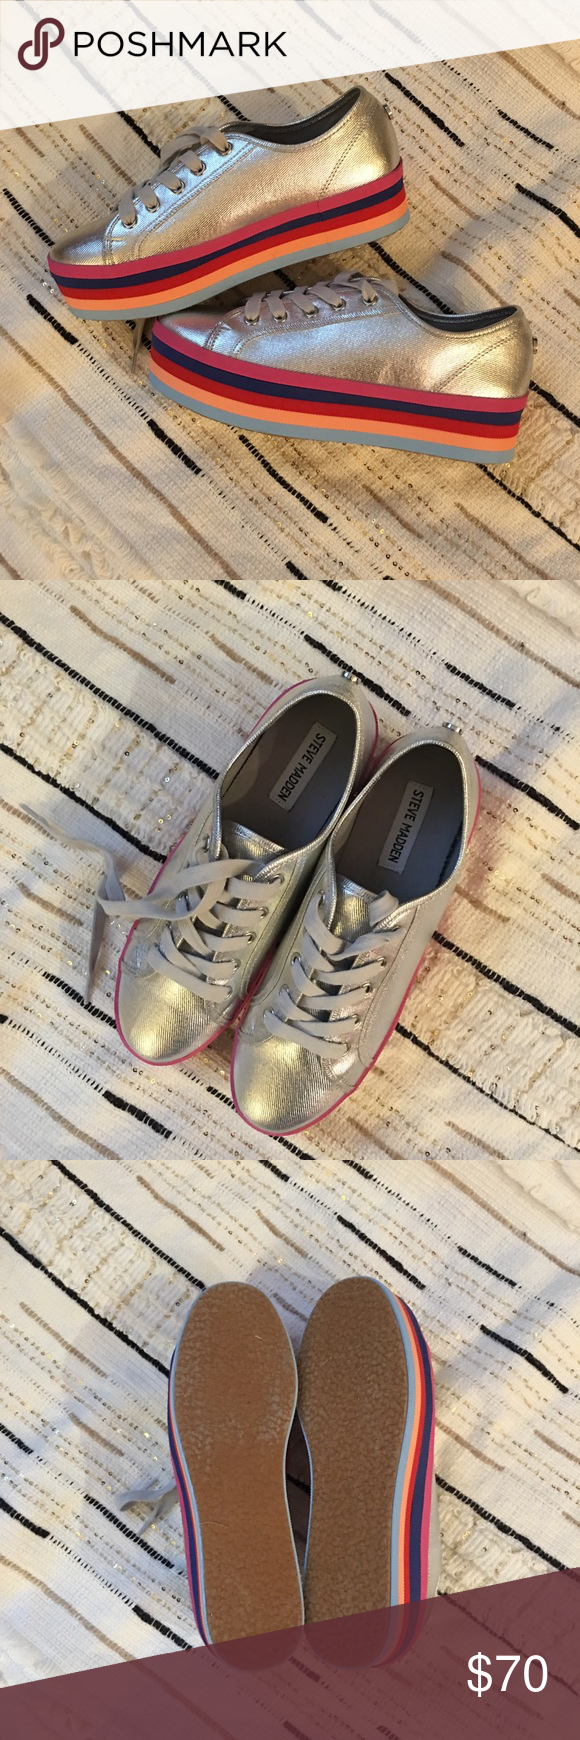 27697c1b797 Steve Madden rainbow platforms ✨ Cute Steve Madden silver   rainbow  platform sneakers! Grey laces. Never worn